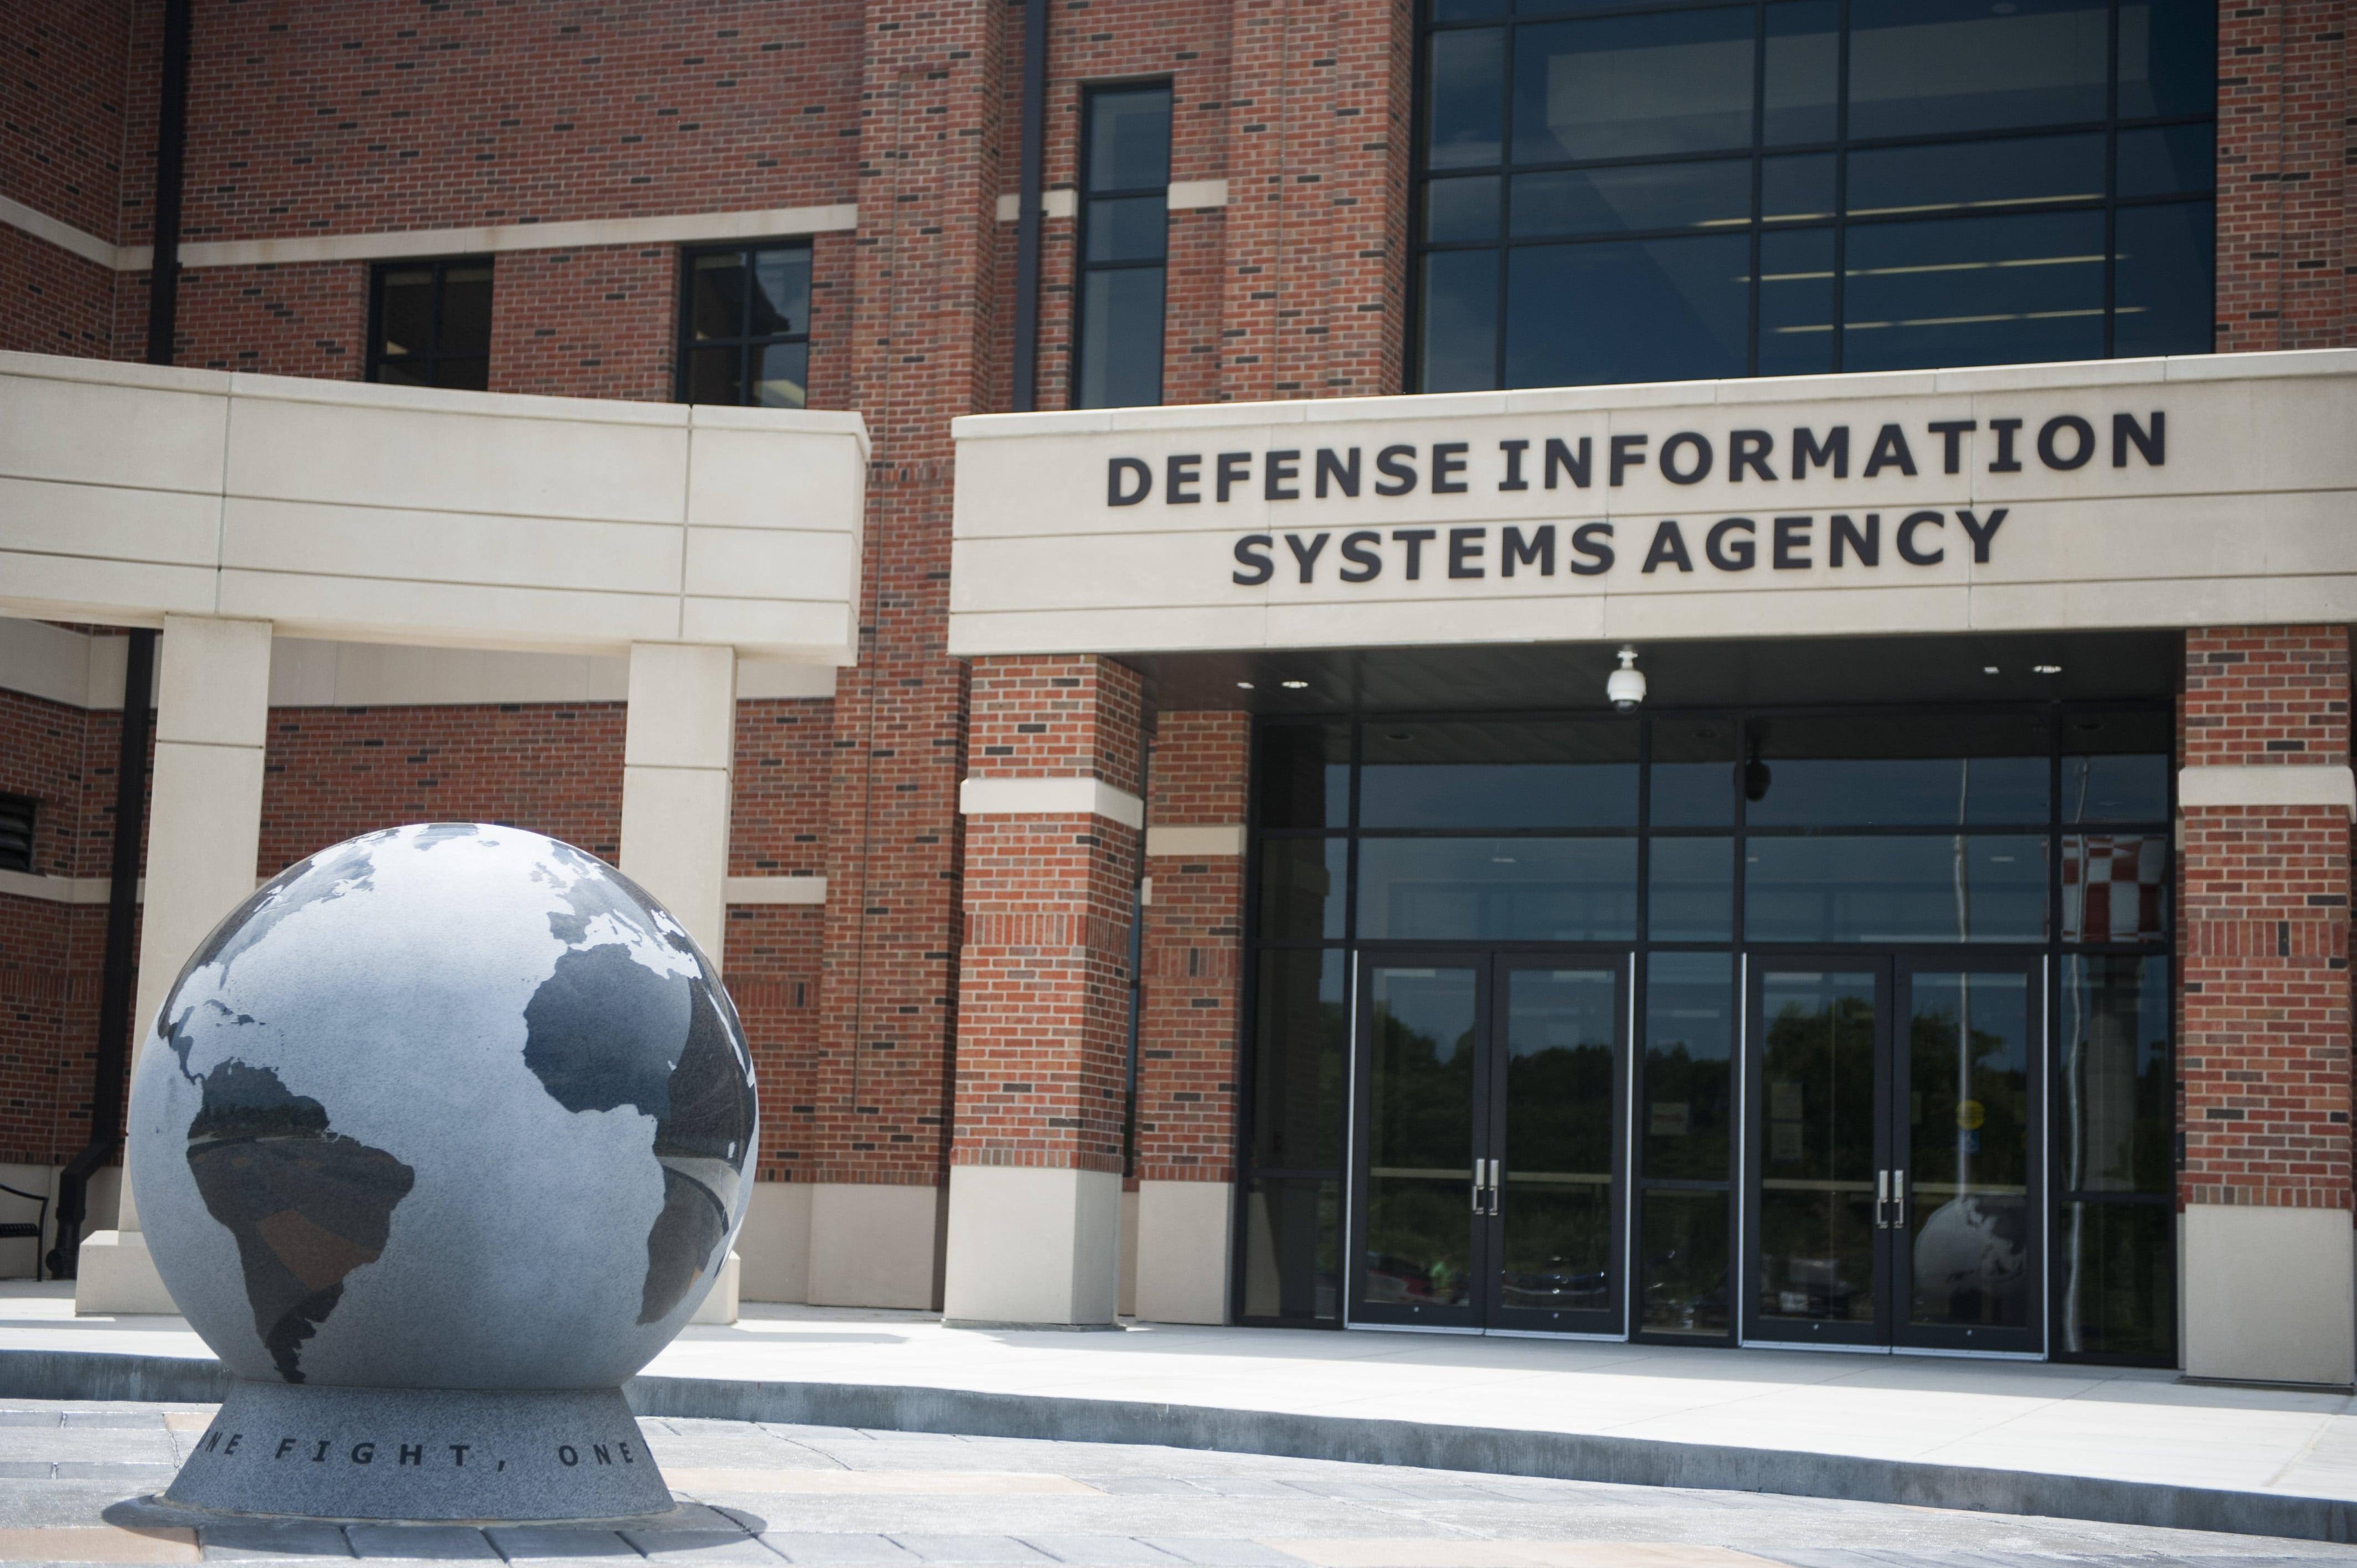 Major IT firm gets $49 million OTA to build DoD's new